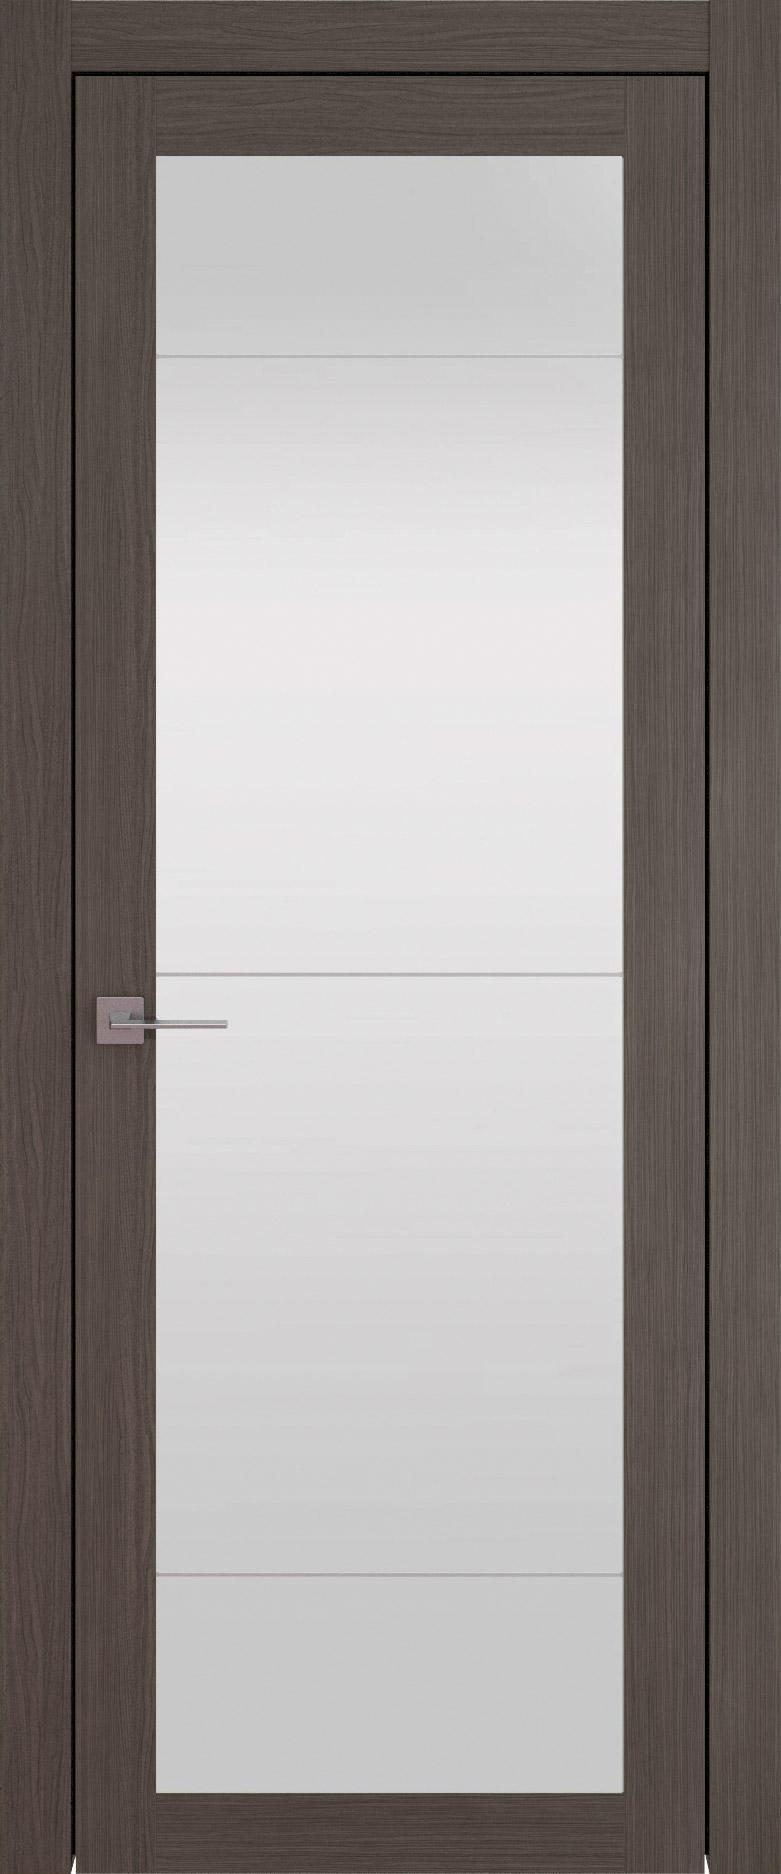 Tivoli З-3 цвет - Дуб графит Со стеклом (ДО)